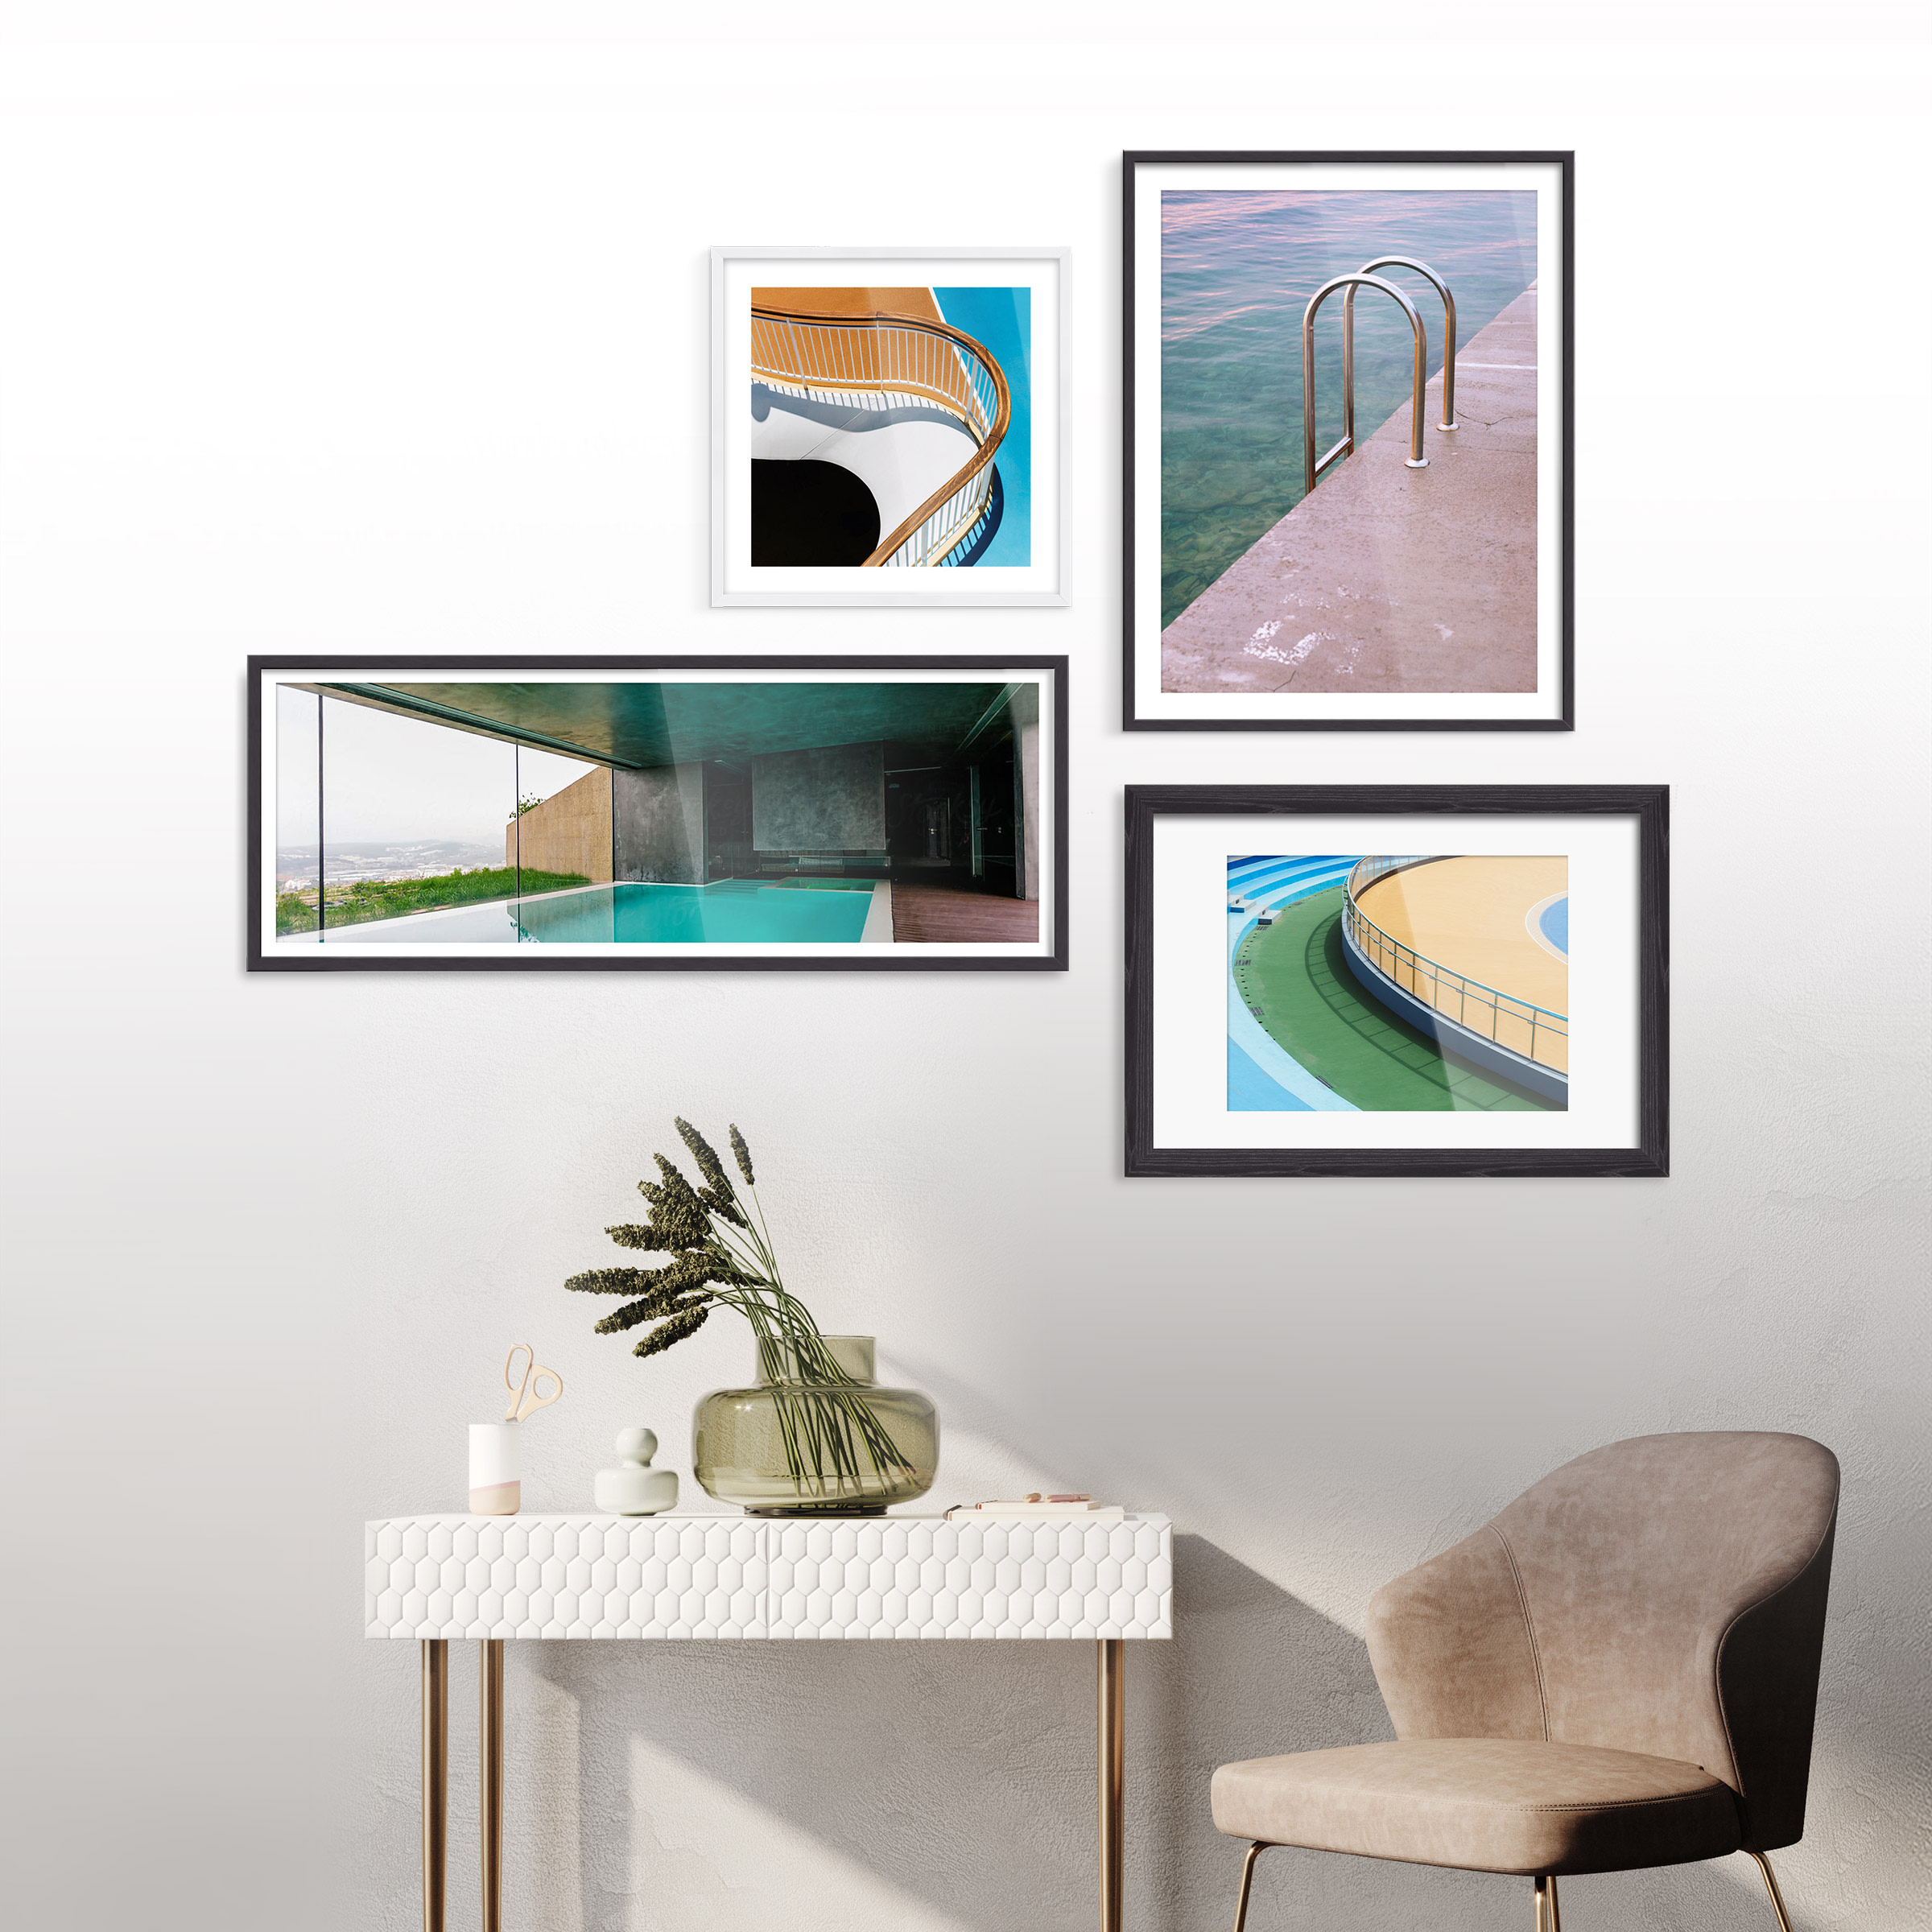 print-on-kodak-pro-endura-architektur-inspiration-1200x1200.jpg